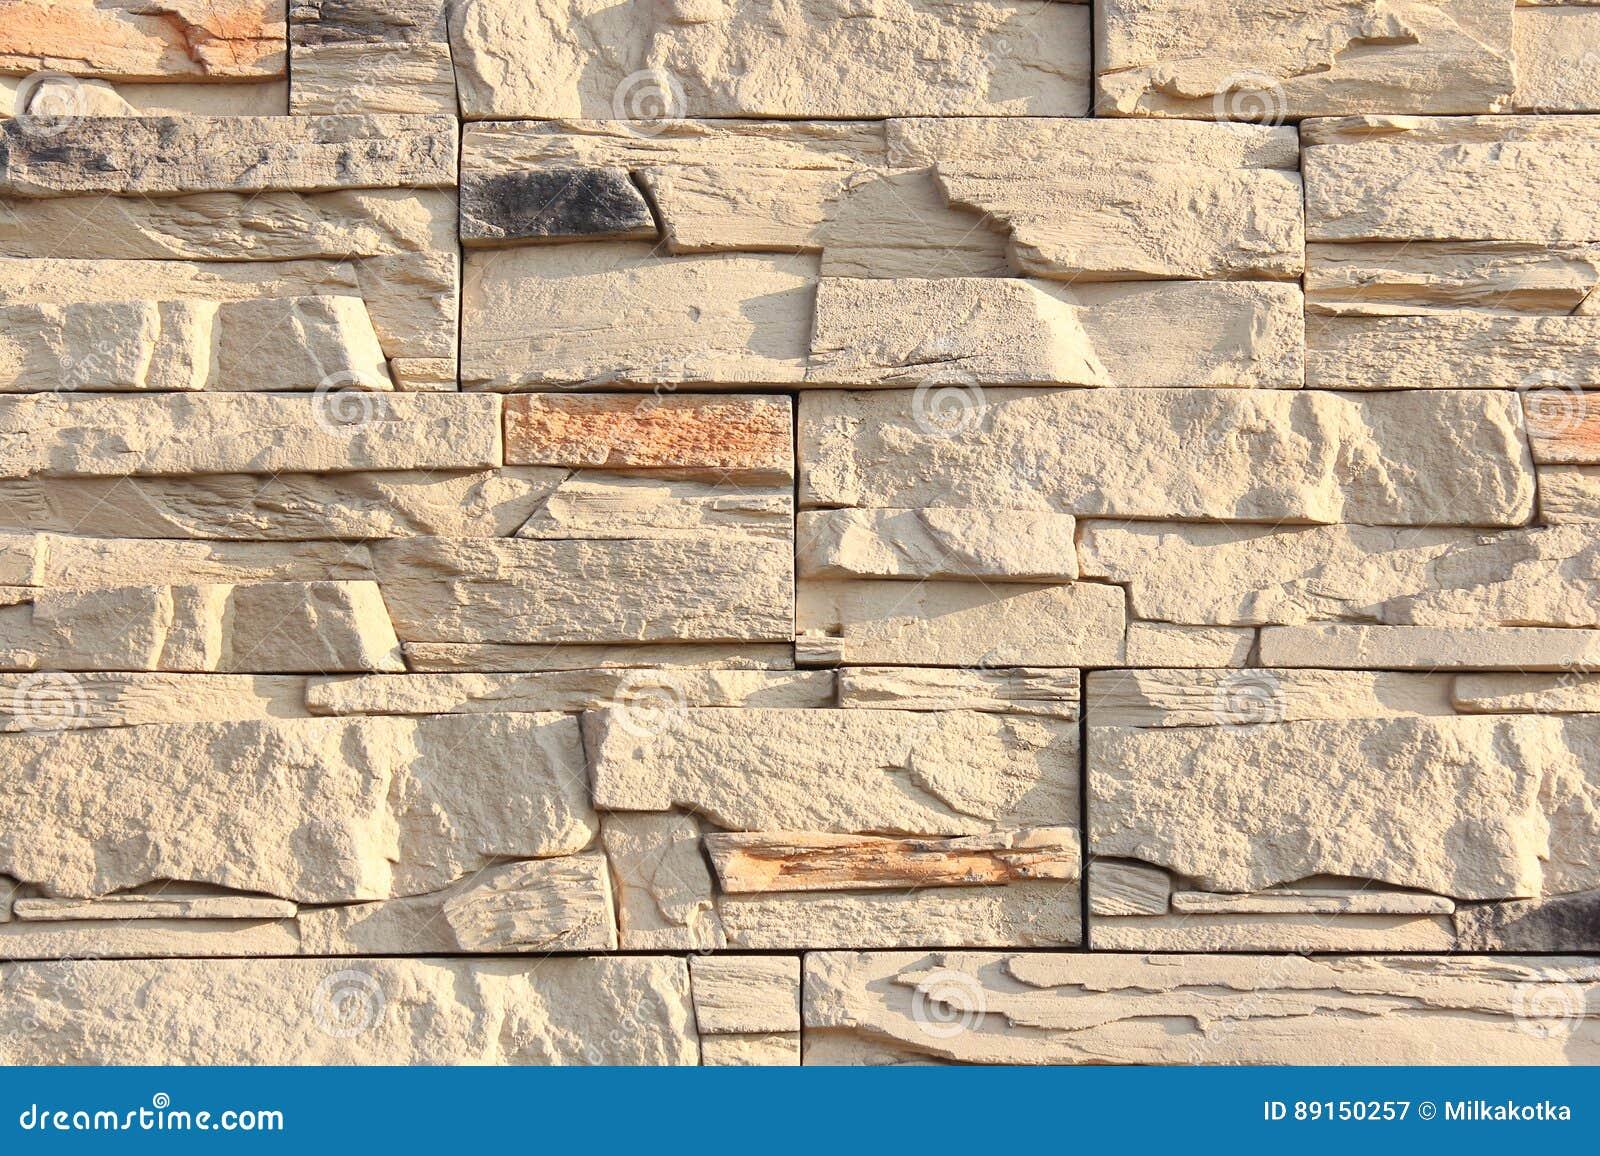 Piedra decorativa pared perfect podamos with piedra - Piedra decorativa pared ...